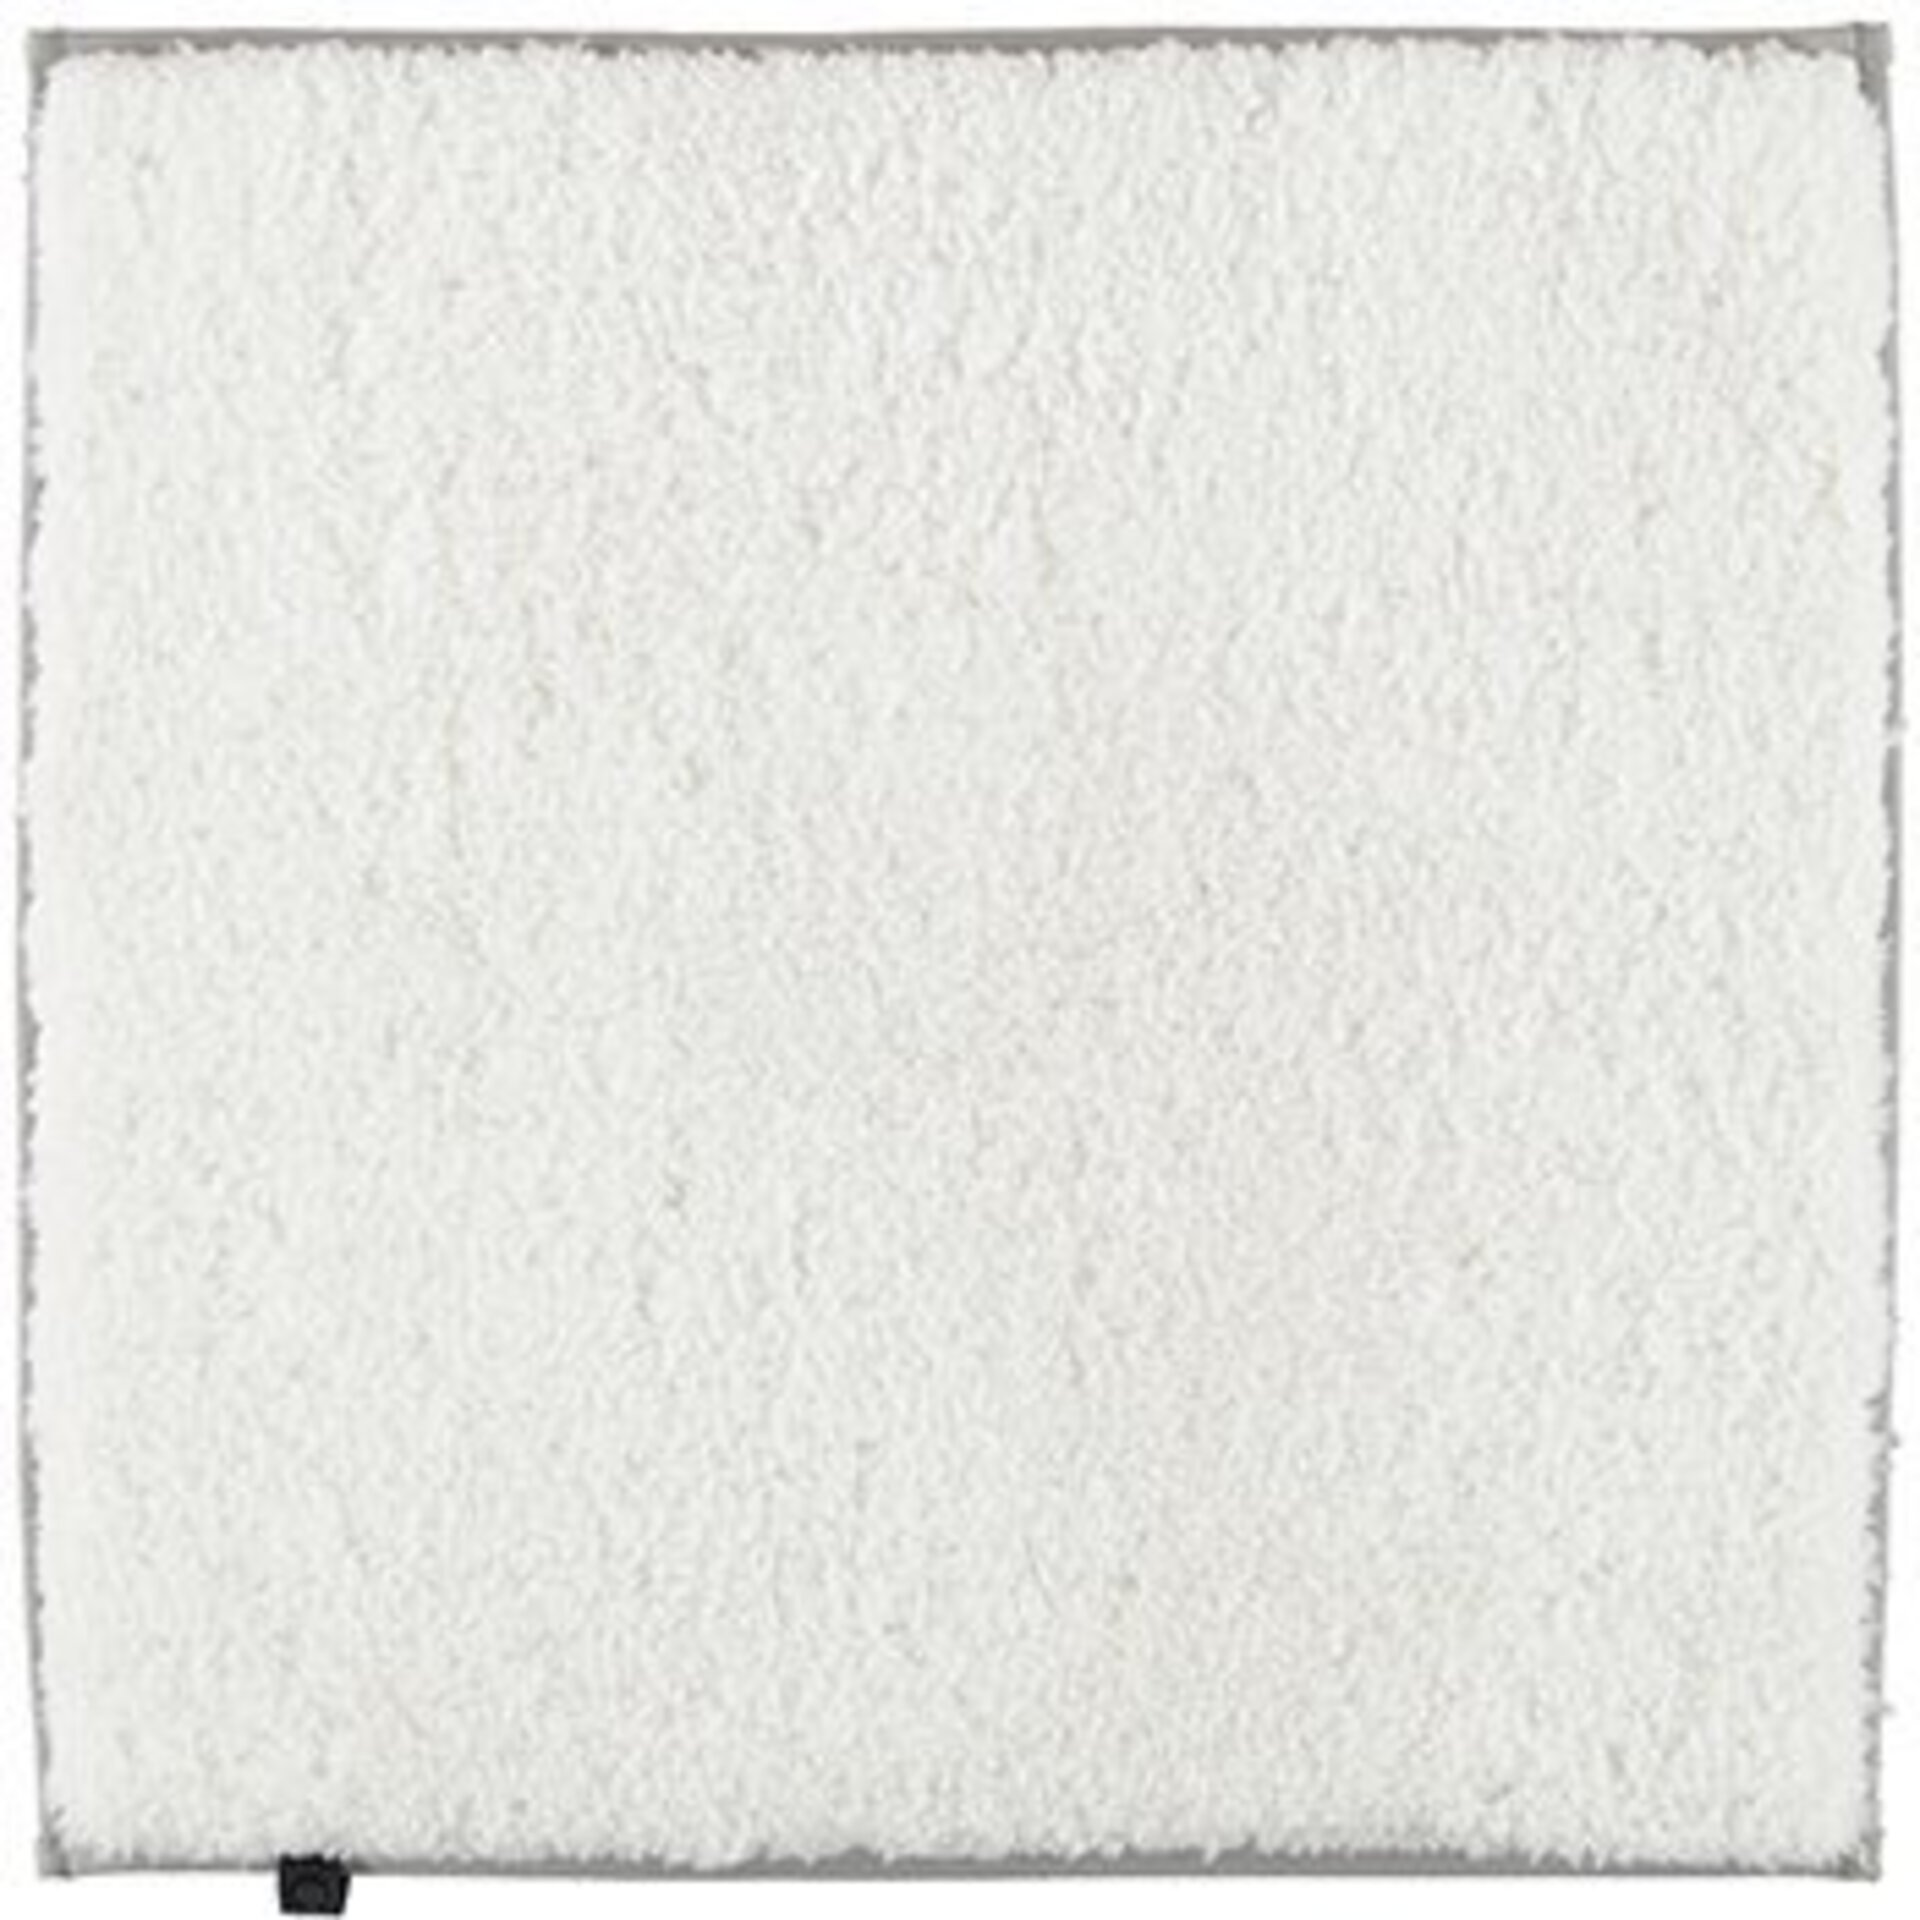 Badteppich Frame Cawö Textil 60 x 60 cm